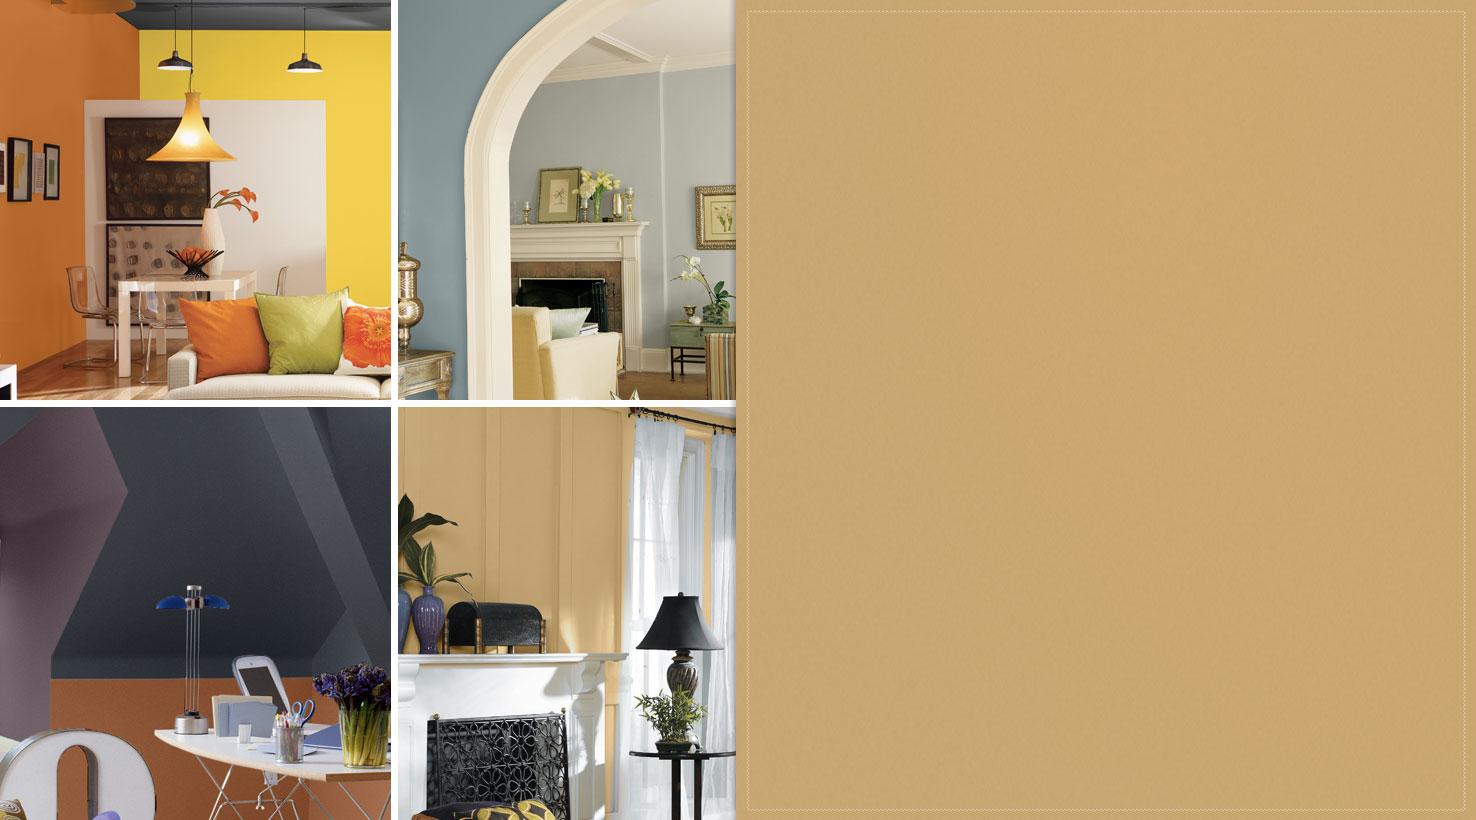 level a landing asd 2015 colormix carousel banner. Black Bedroom Furniture Sets. Home Design Ideas